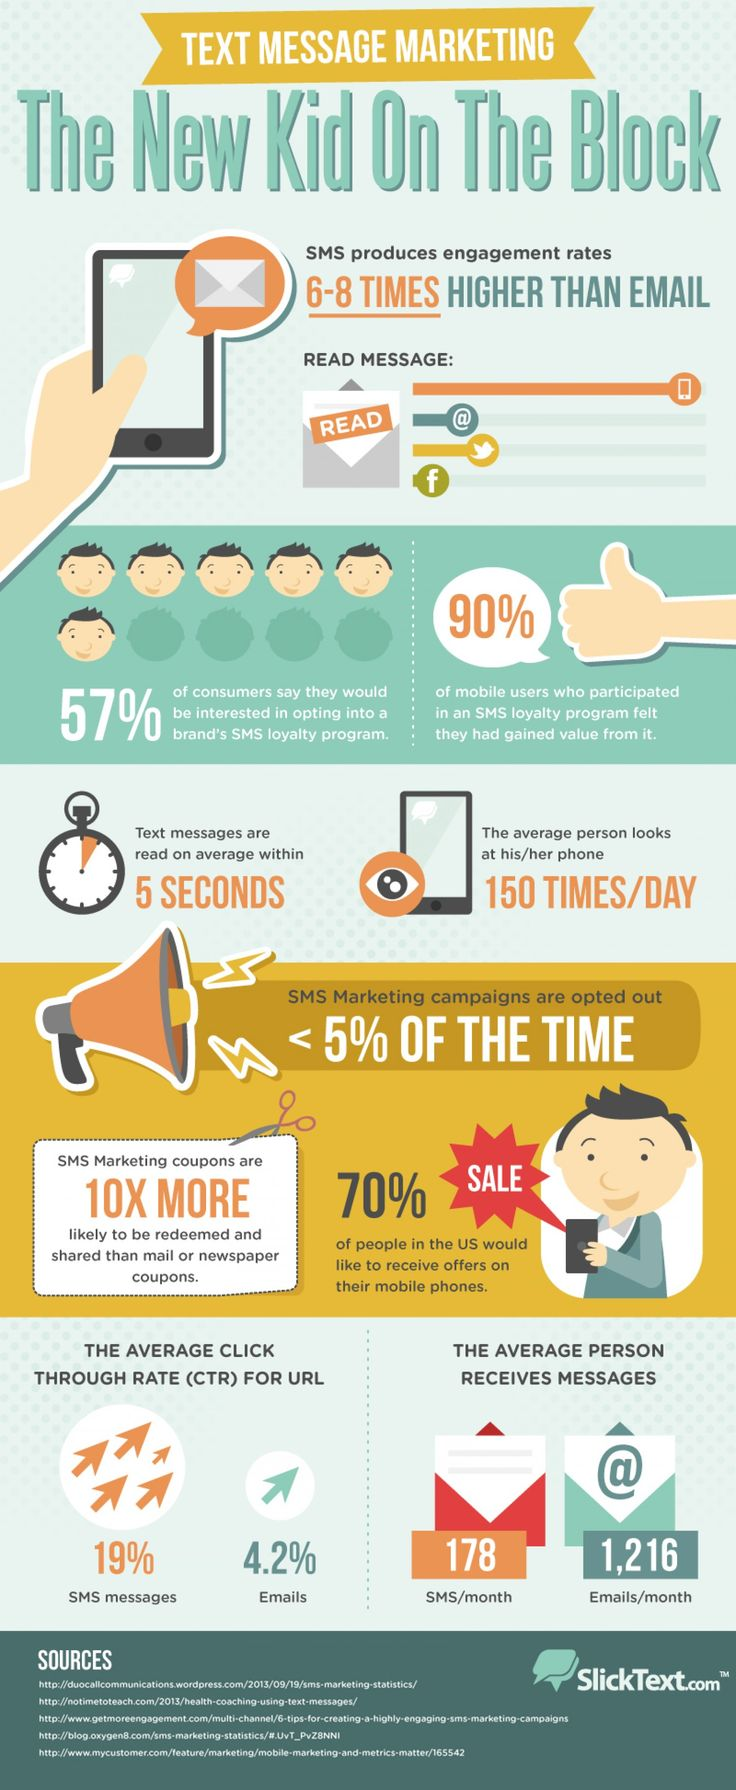 Best 25 text message marketing ideas on pinterest mobile text message marketing the new kid on the block infographic buycottarizona